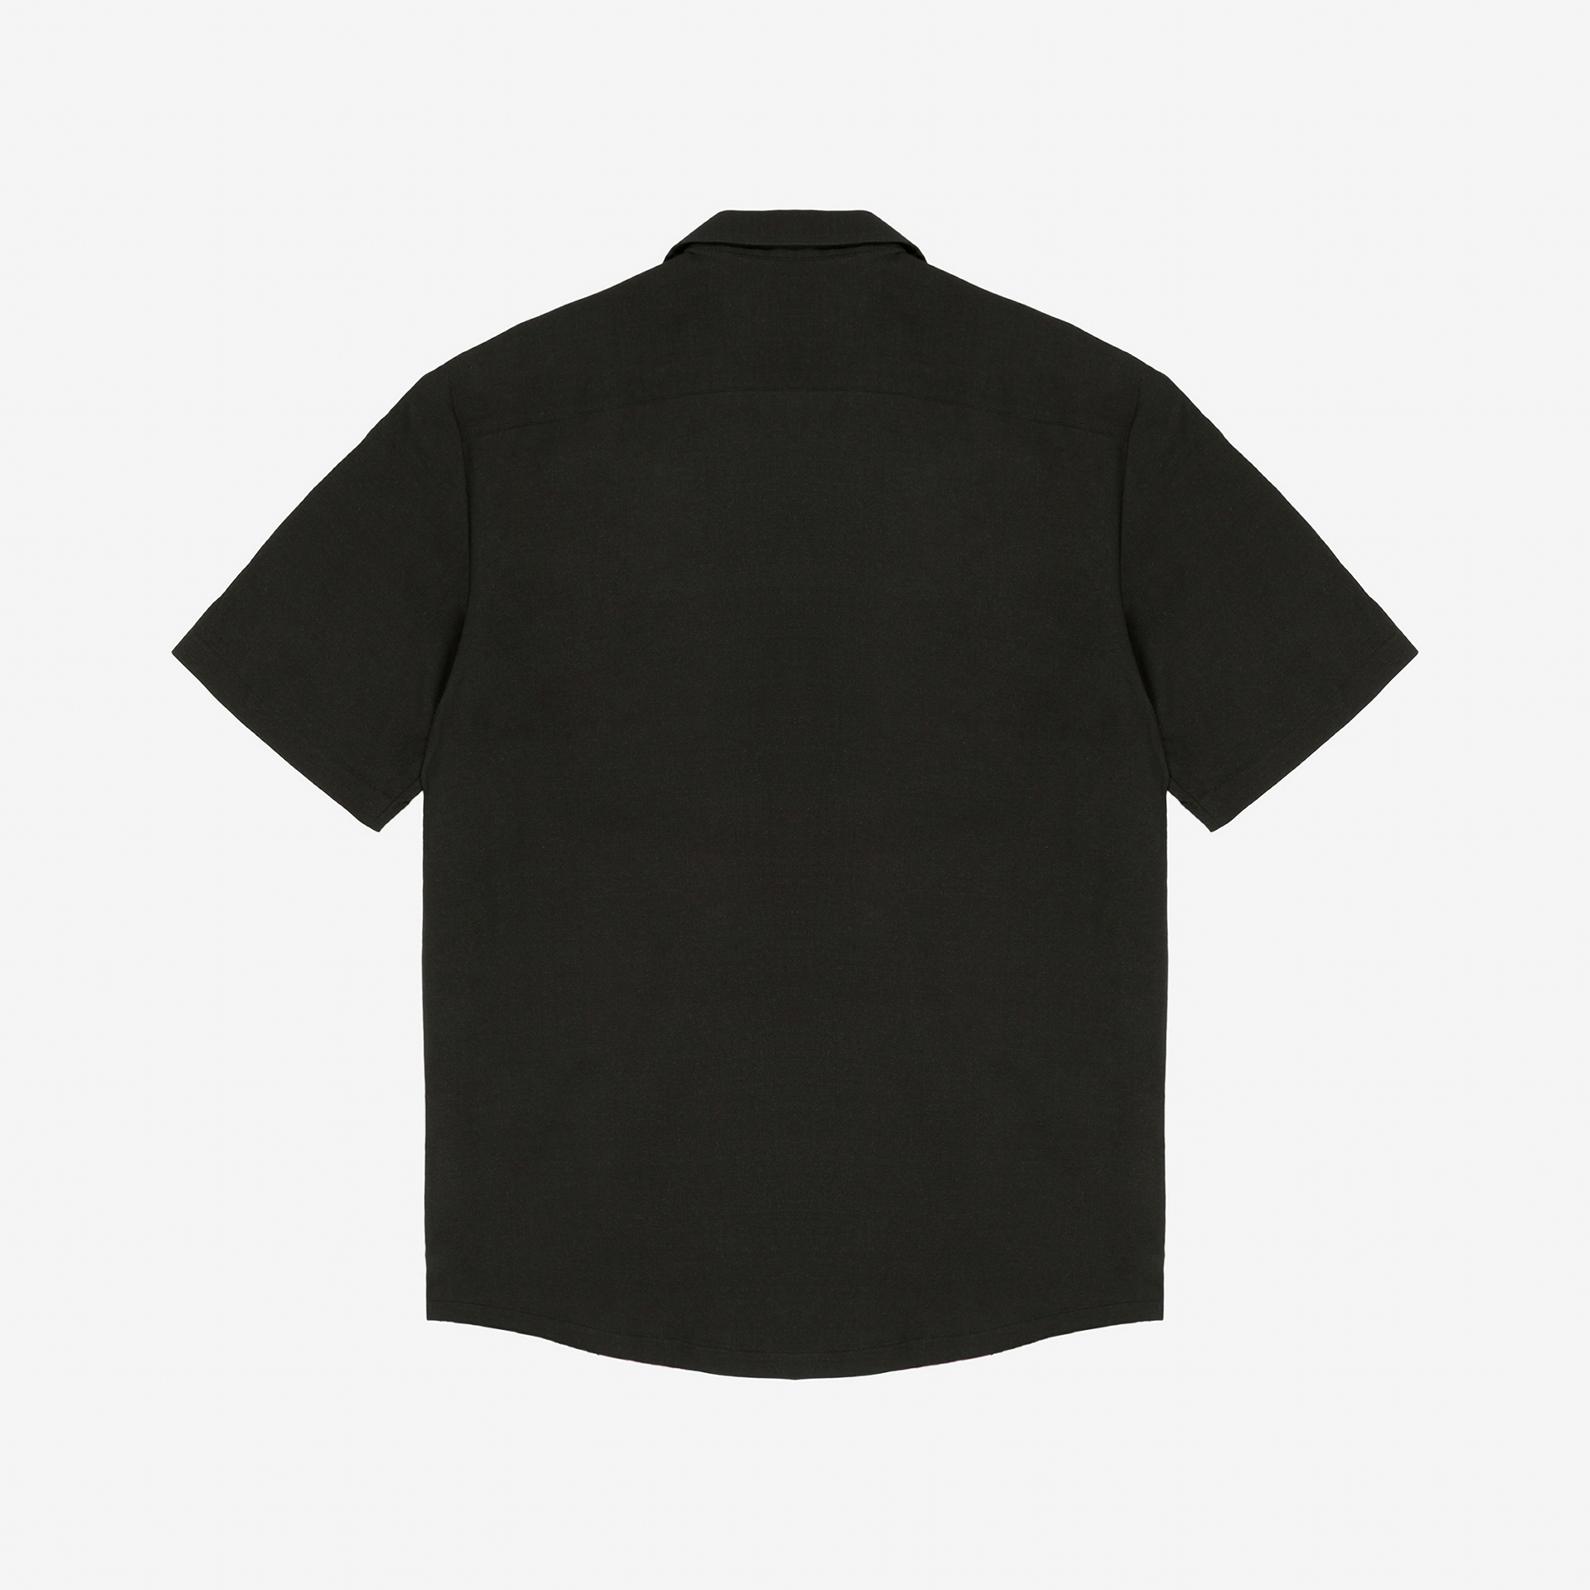 【PAS DE MER/パドゥメ】BALLET SHIRT 半袖シャツ / BLACK